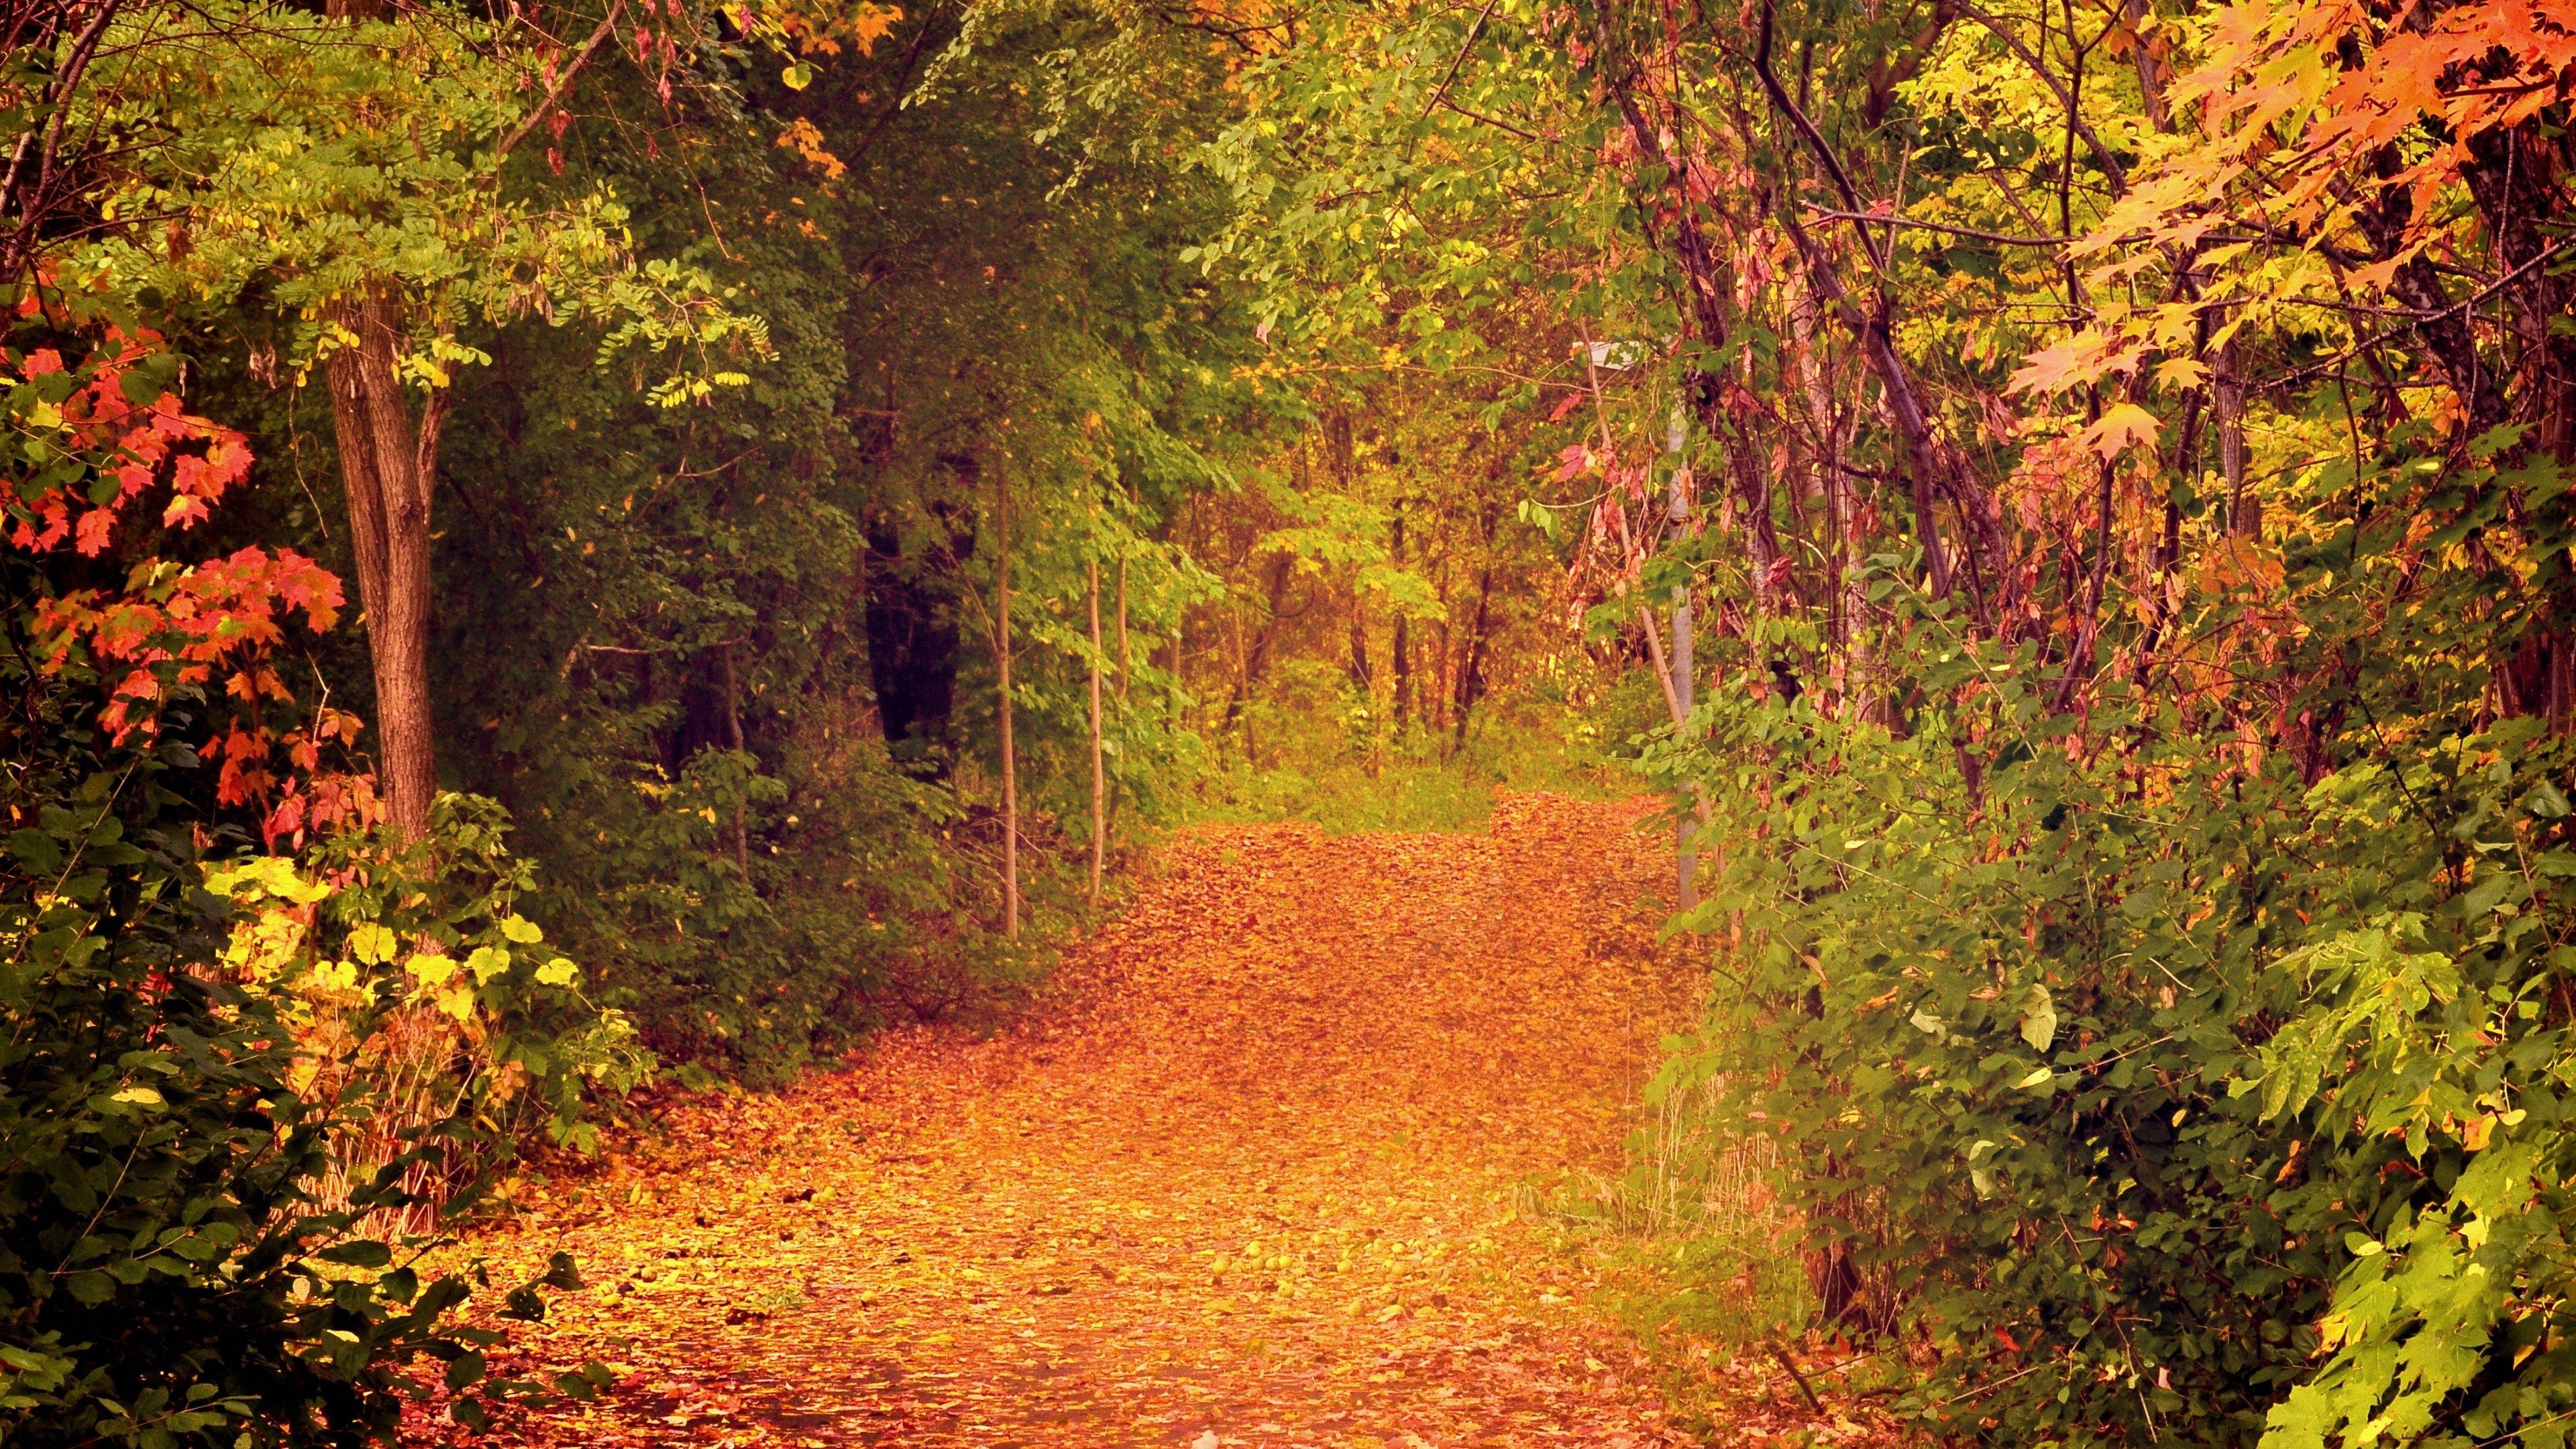 Pocketfullofgrace Com Pocketfullofgrace Resources And Information Autumn Wallpaper Hd Tree Wallpaper Autumn Forest